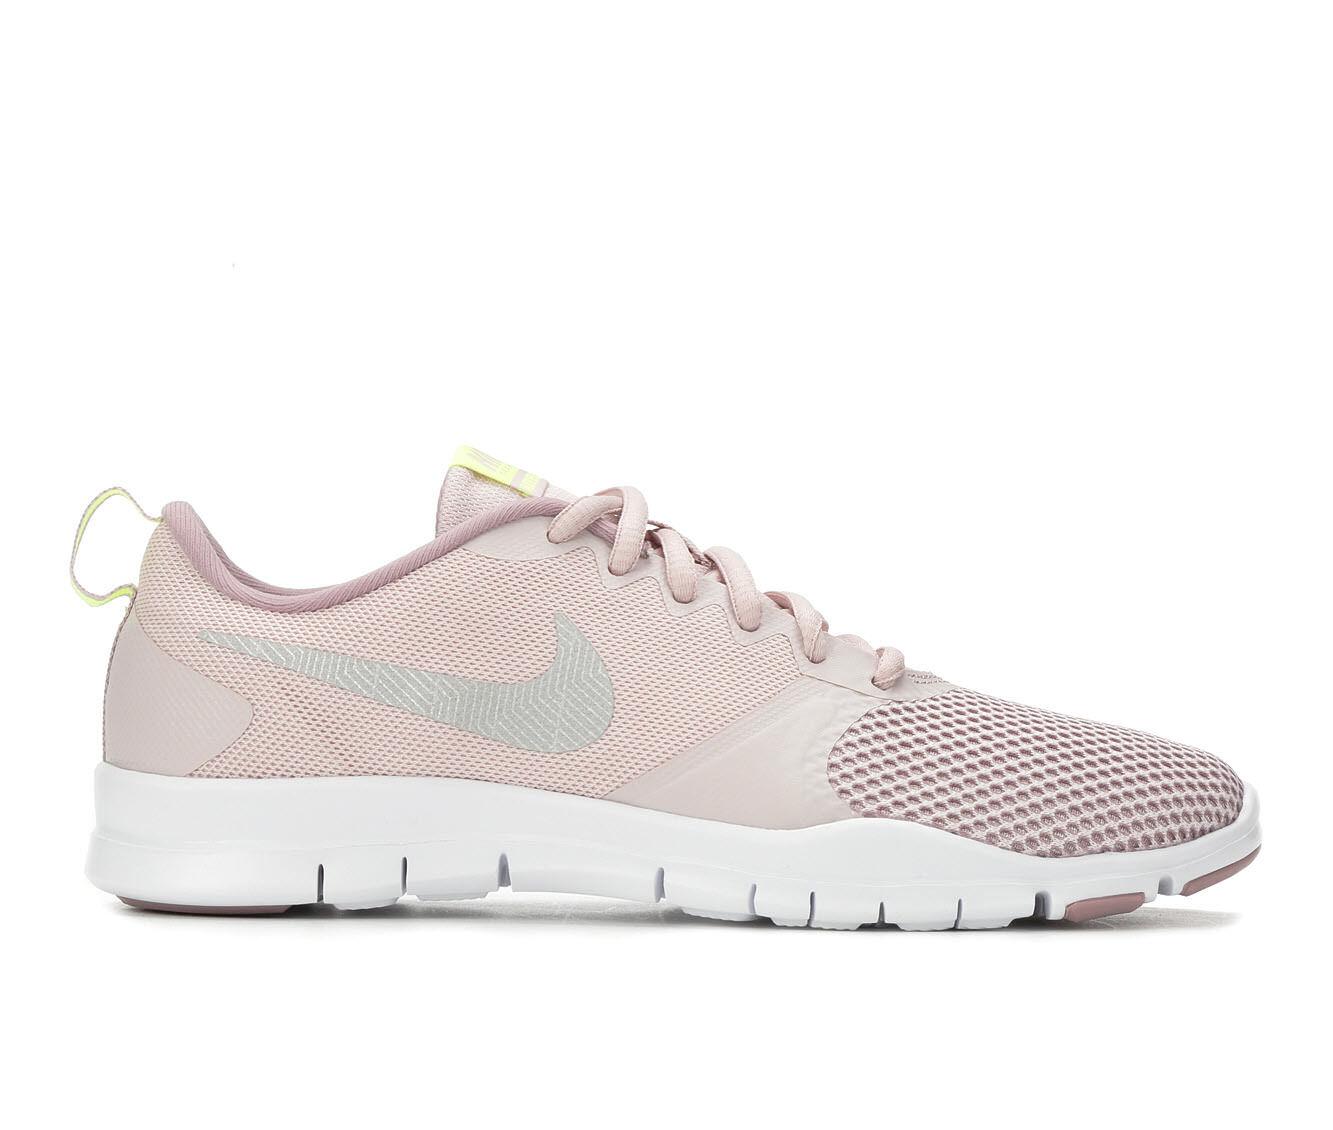 fcea131b19c6 coupon code nike trainer boots womens ff48d 1cc97  coupon womens nike flex  essential training shoes shoe carnival 1283c c046e